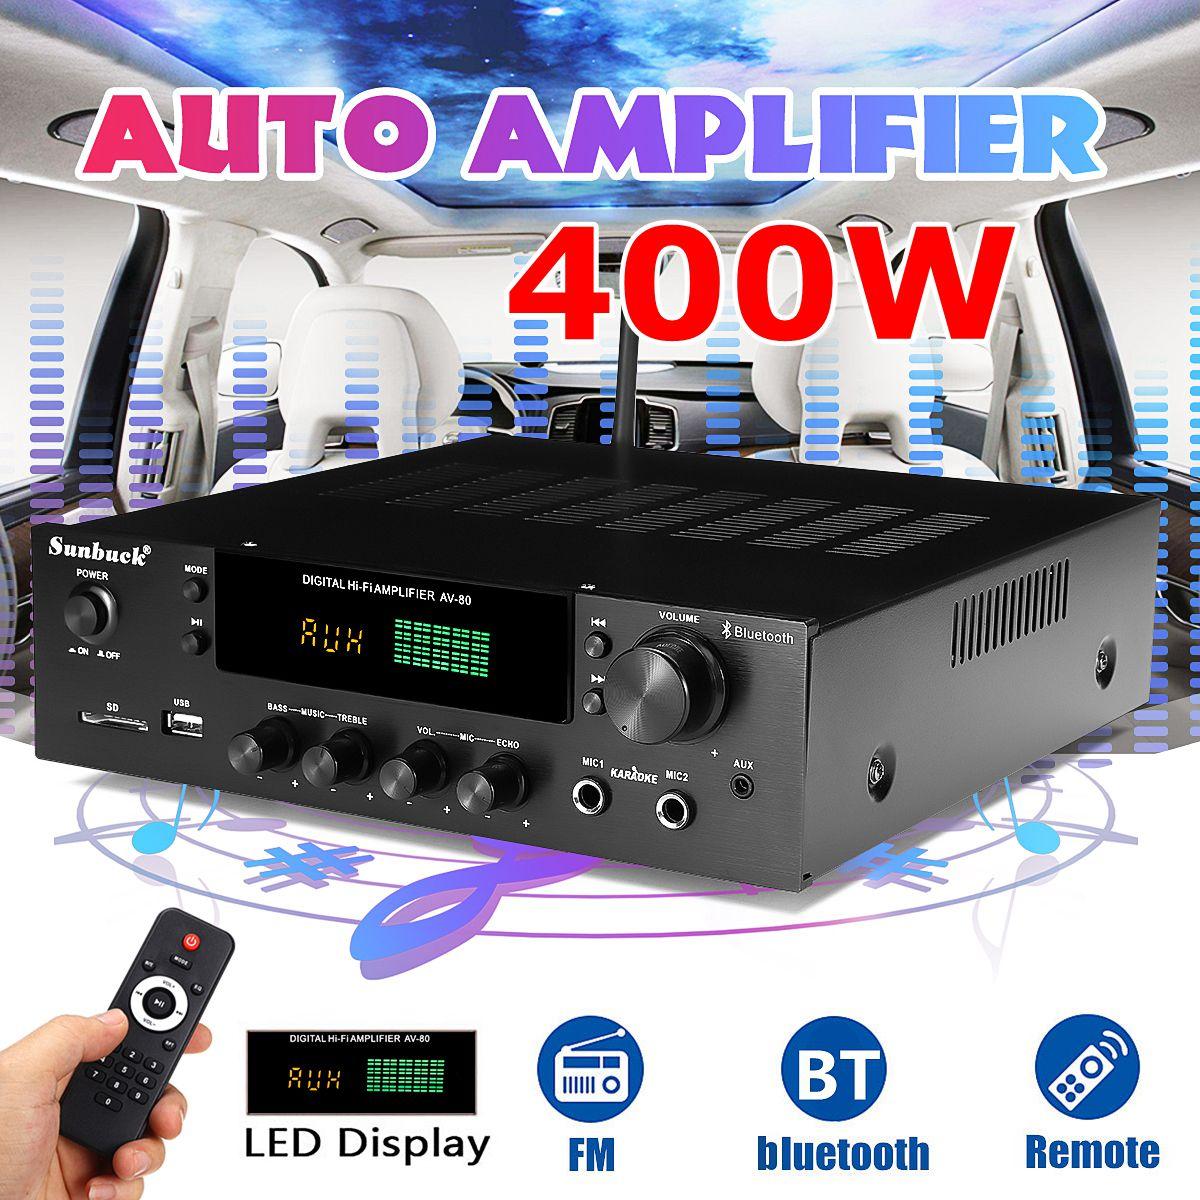 Sunbuck 220V 400W Bluetooth Stereo Amplifier HiFi 2.0 Audio Power Remote Control Headphone Jack USB SD AV-80